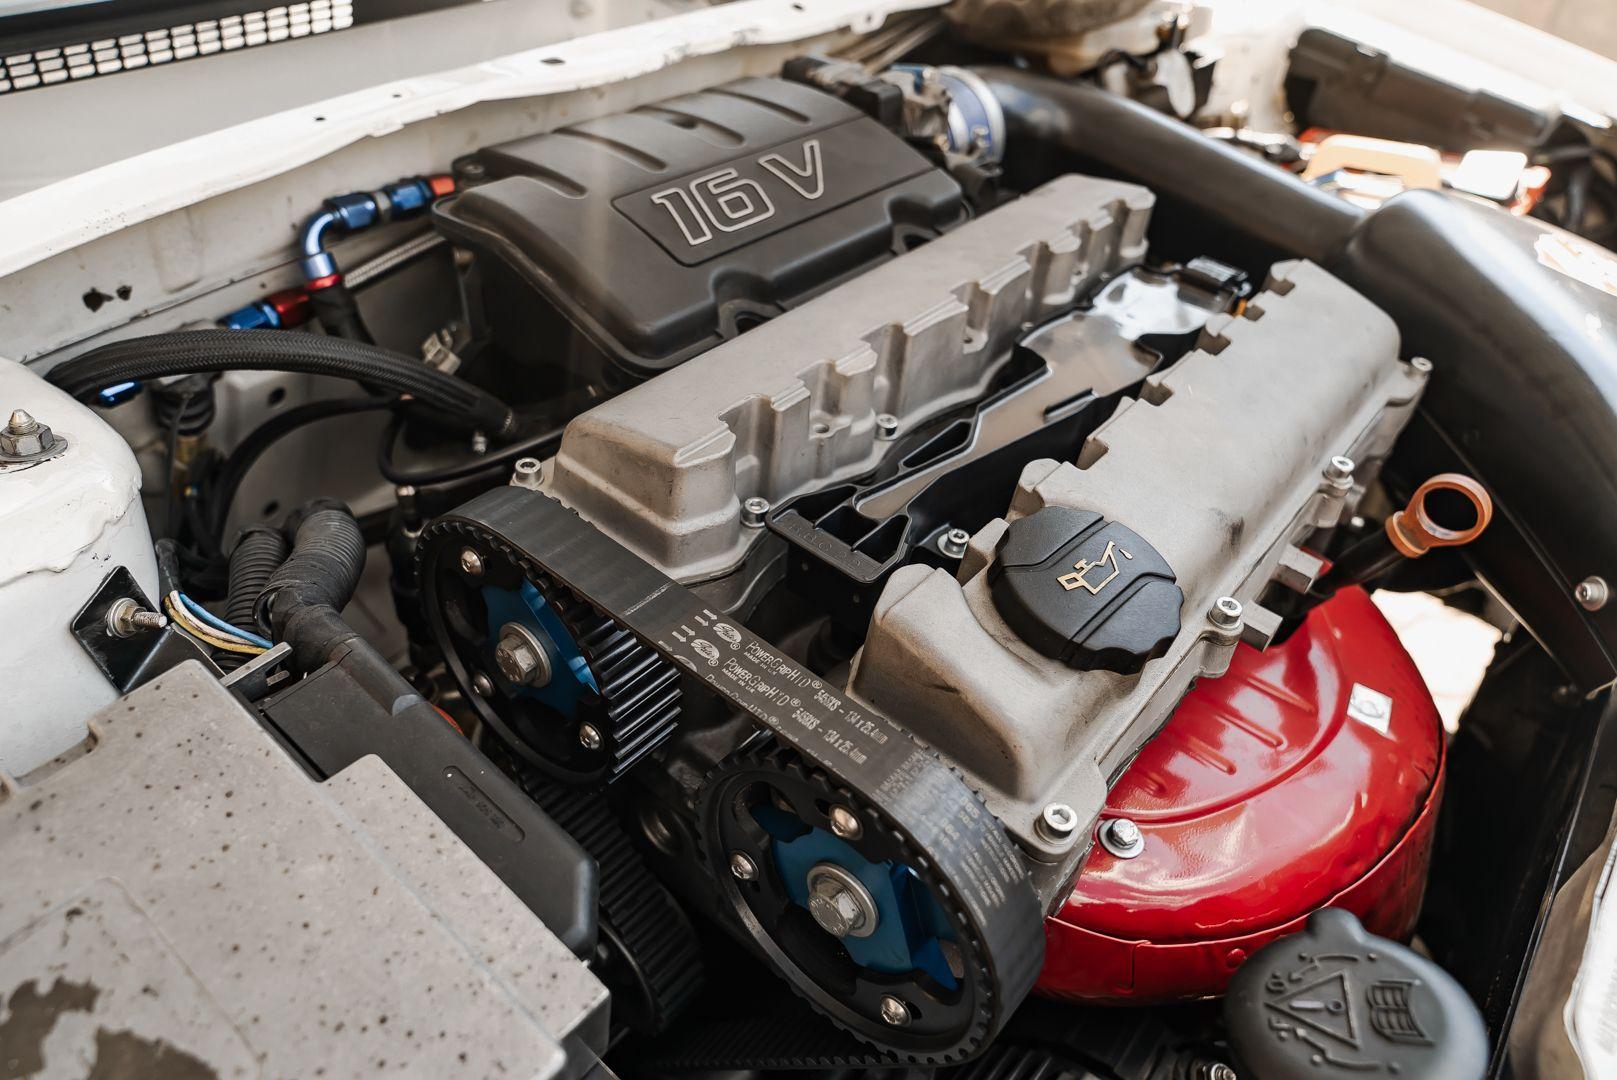 1998 Peugeot 106 Rallye S16 Group A 83131